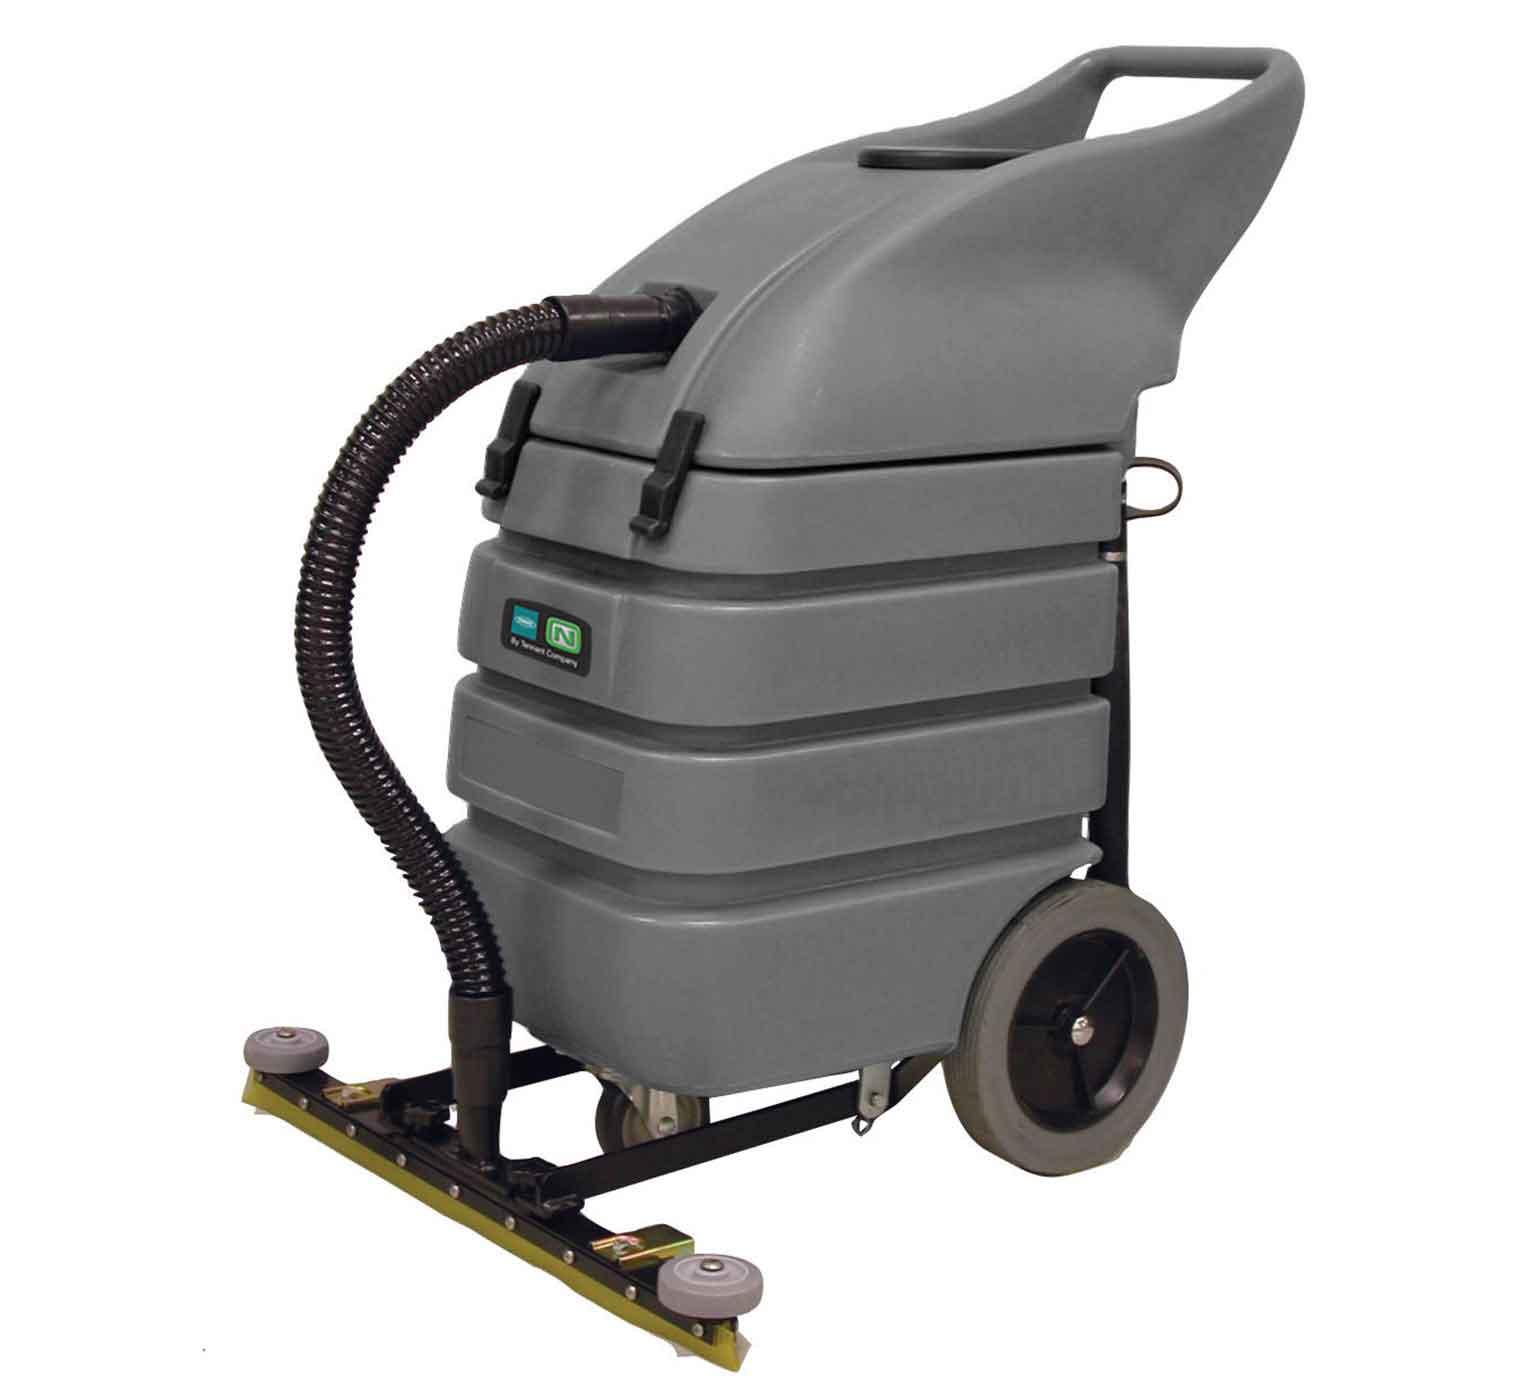 V Wd 15 V Wd 15s V Wd 16p V Wd 16b Wet Dry Vacuums